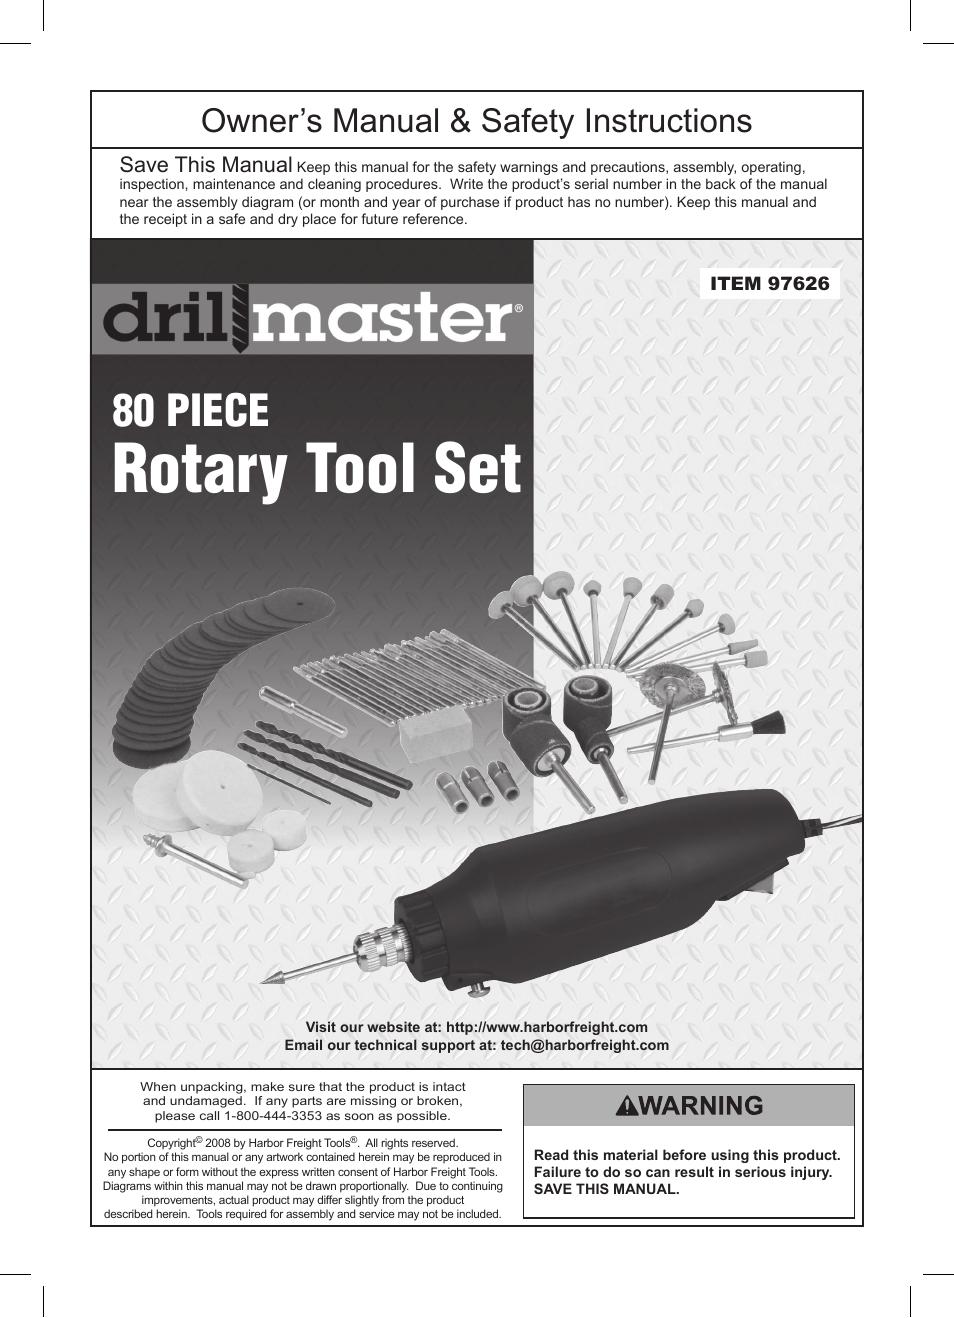 drill master wiring diagram